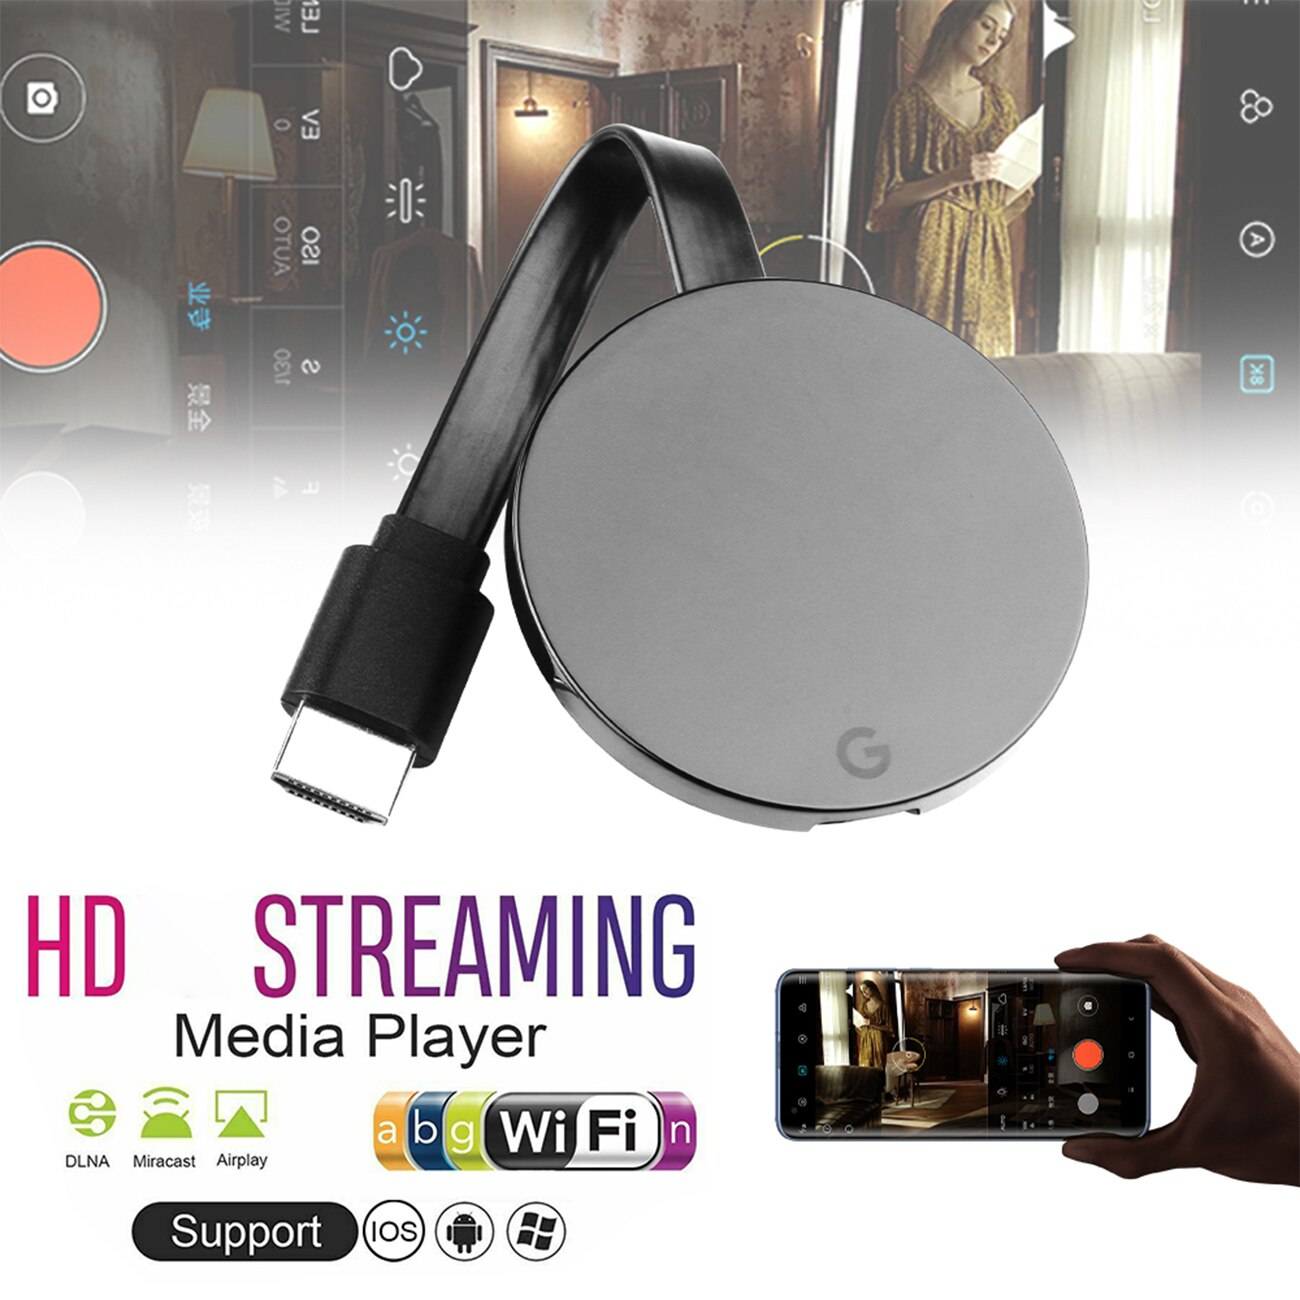 New WiFi Wireless Display Dongle TV Stick for google chromecast ultra 4K TV Stick Media Video Stream